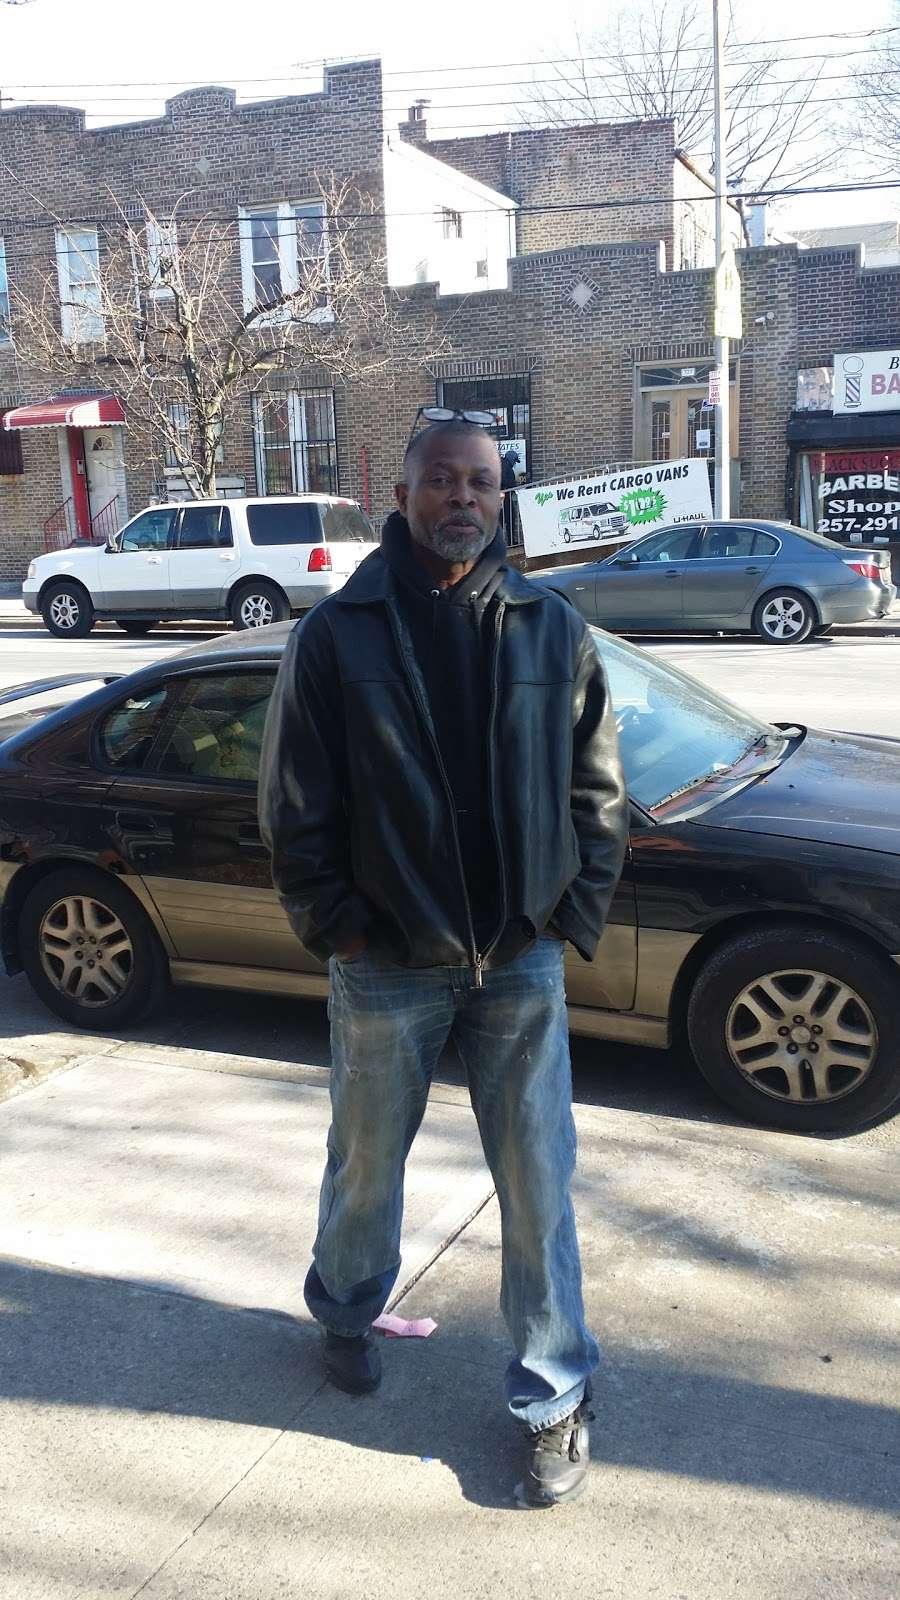 Murrays Barber Shop - hair care  | Photo 1 of 2 | Address: 538 Hegeman Ave # B, Brooklyn, NY 11207, USA | Phone: (718) 272-5081